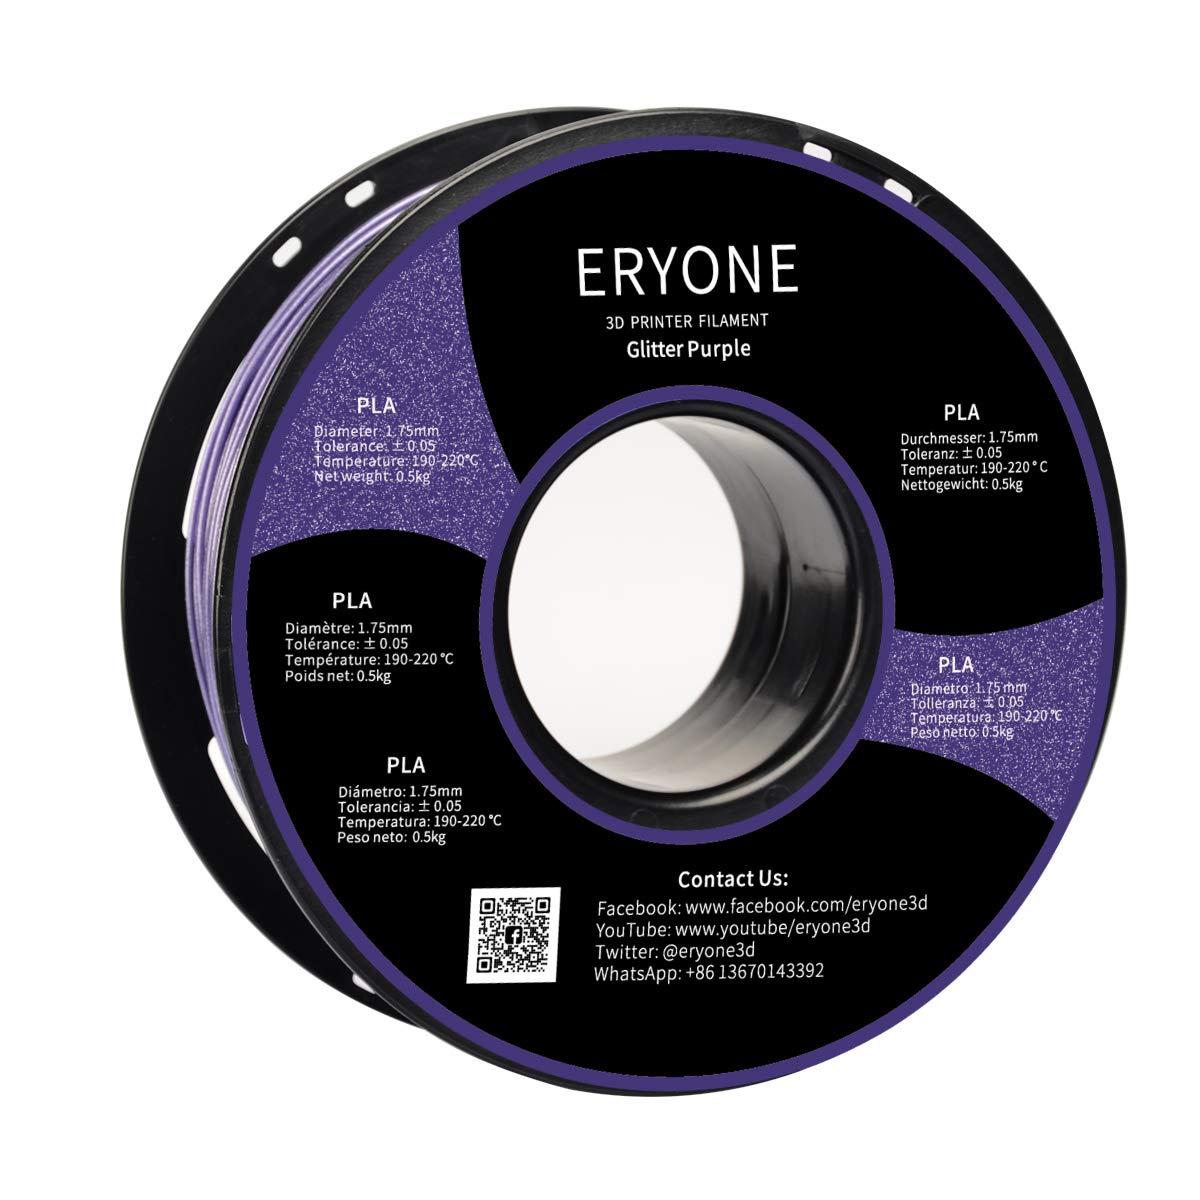 //Spool Blue 2.2LBS ERYONE Sparkly Galaxy Glitter PLA 3D Printer Filament 1.75mm 1kg